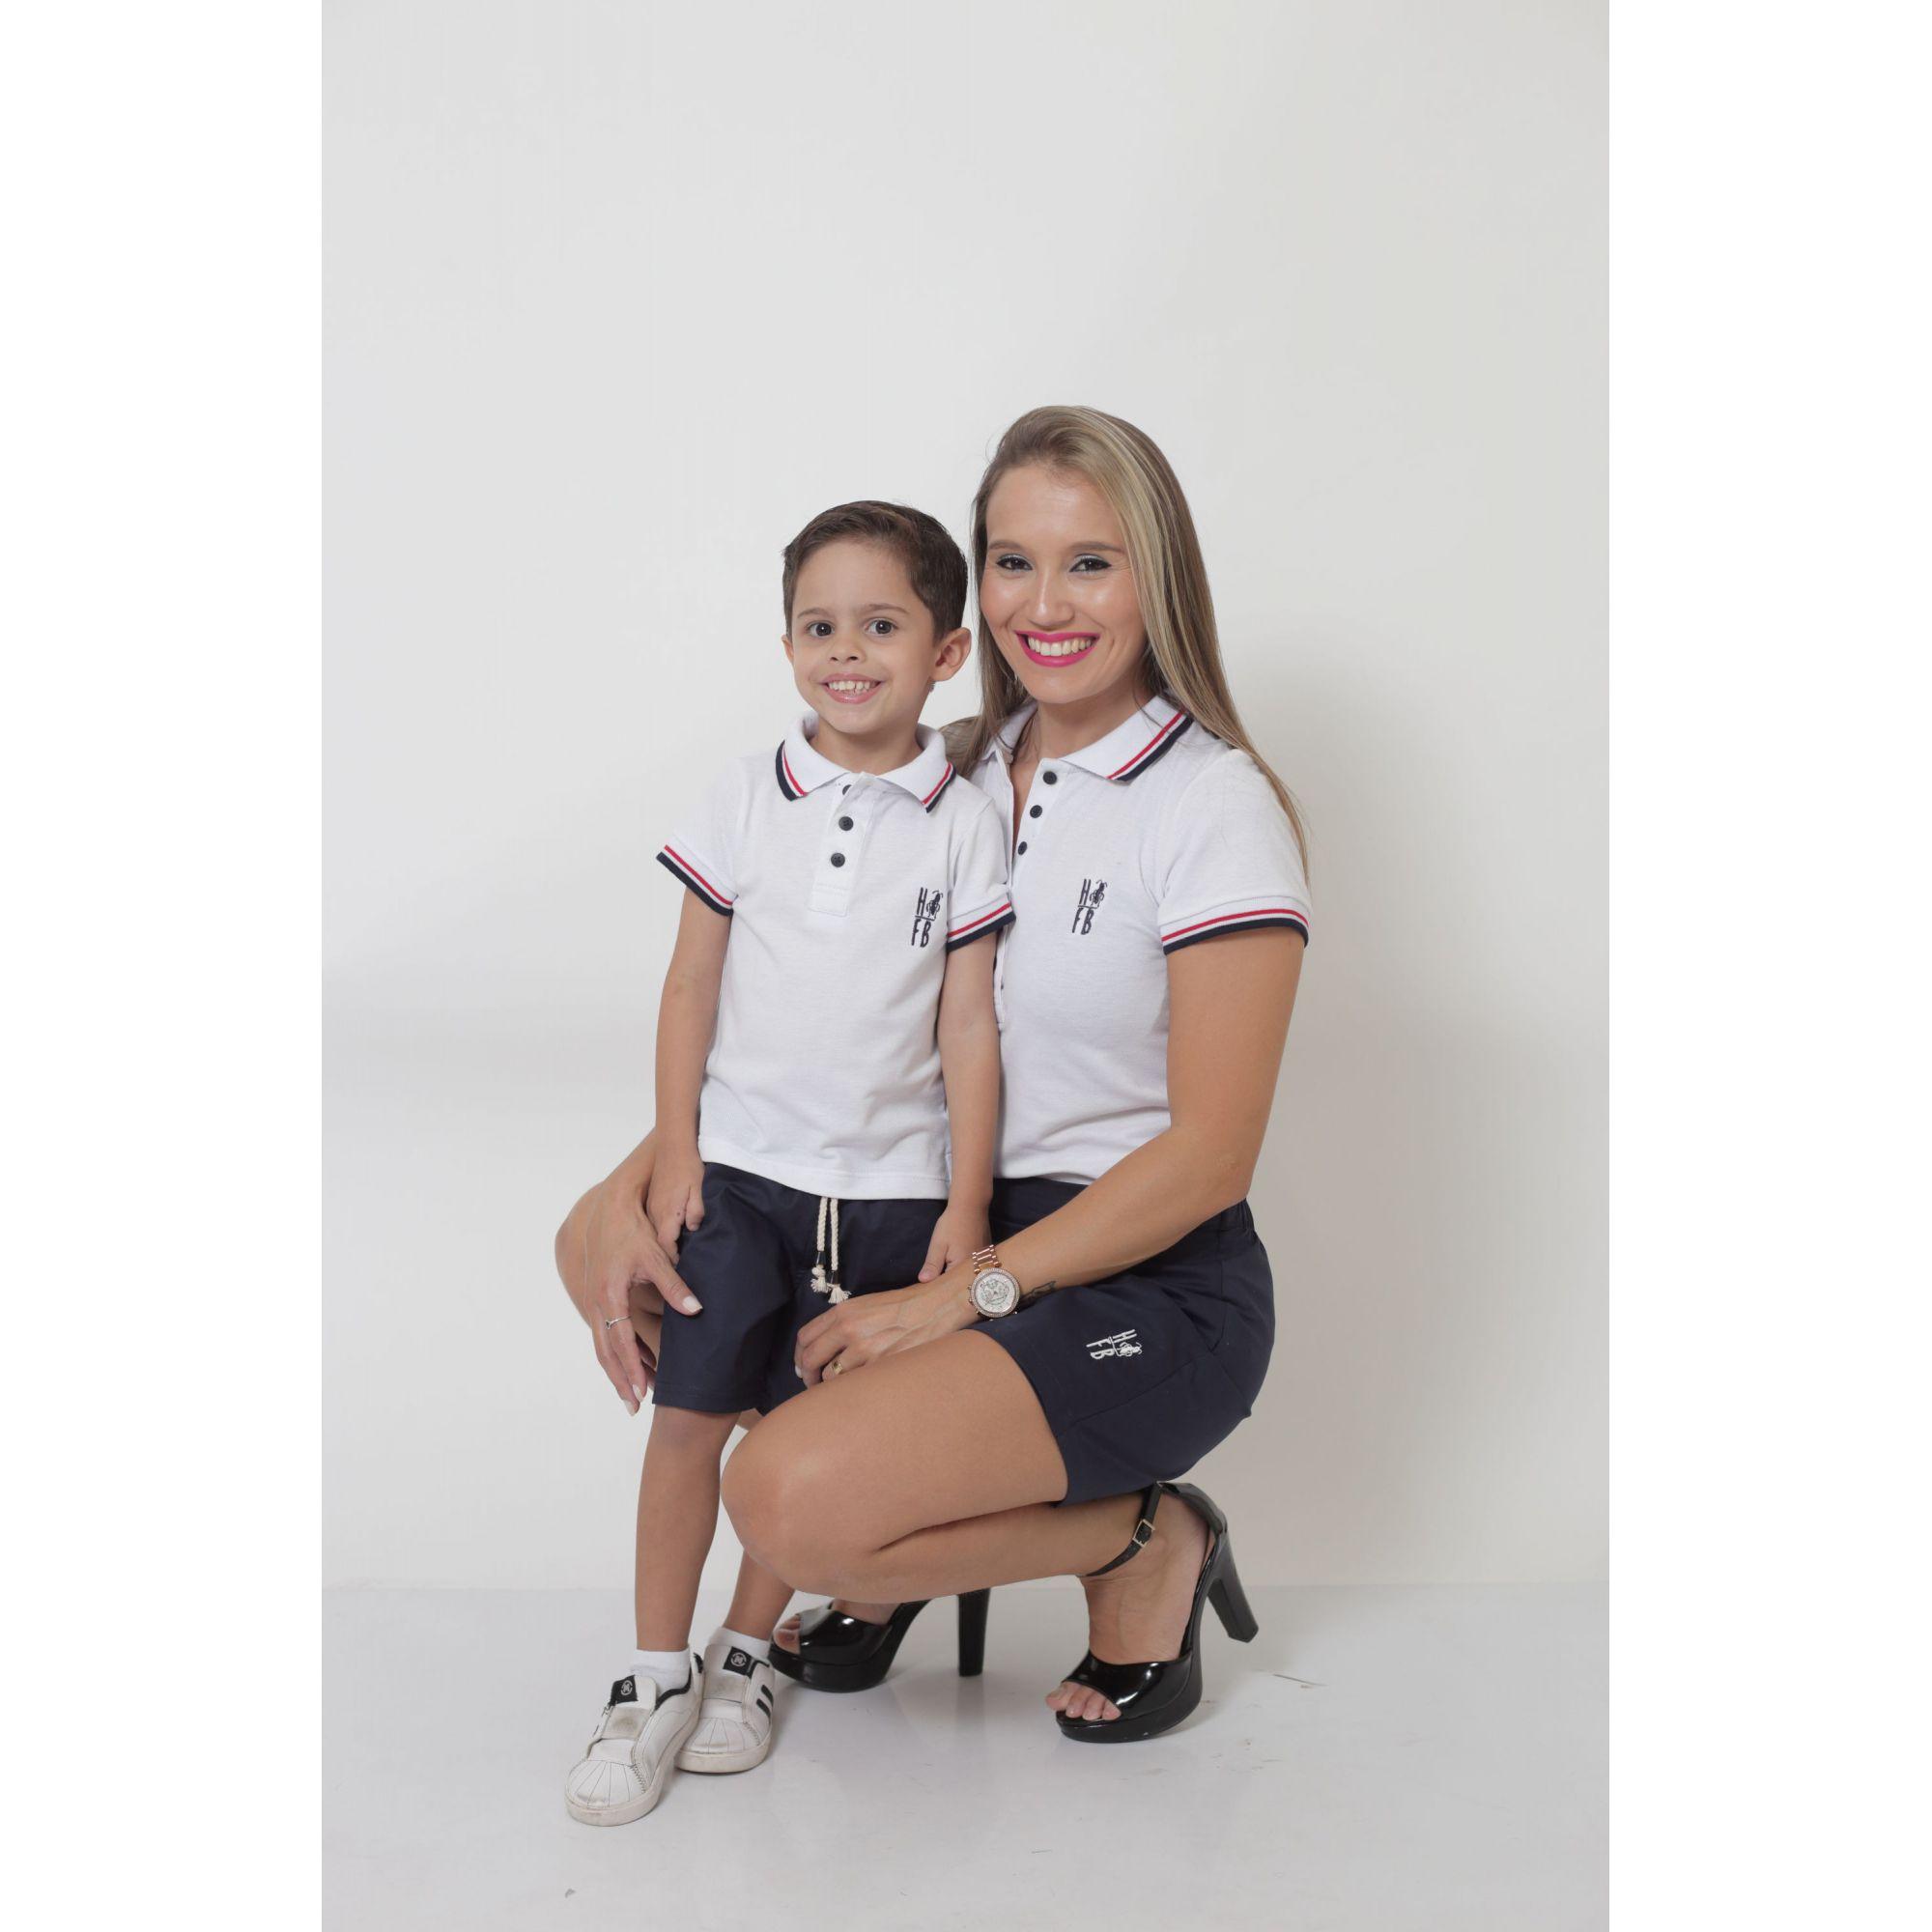 MÃE E FILHO > Kit - Shorts Saia + Bermuda Infantil - Azul Marinho [Coleção Tal Mãe Tal Filho]  - Heitor Fashion Brazil